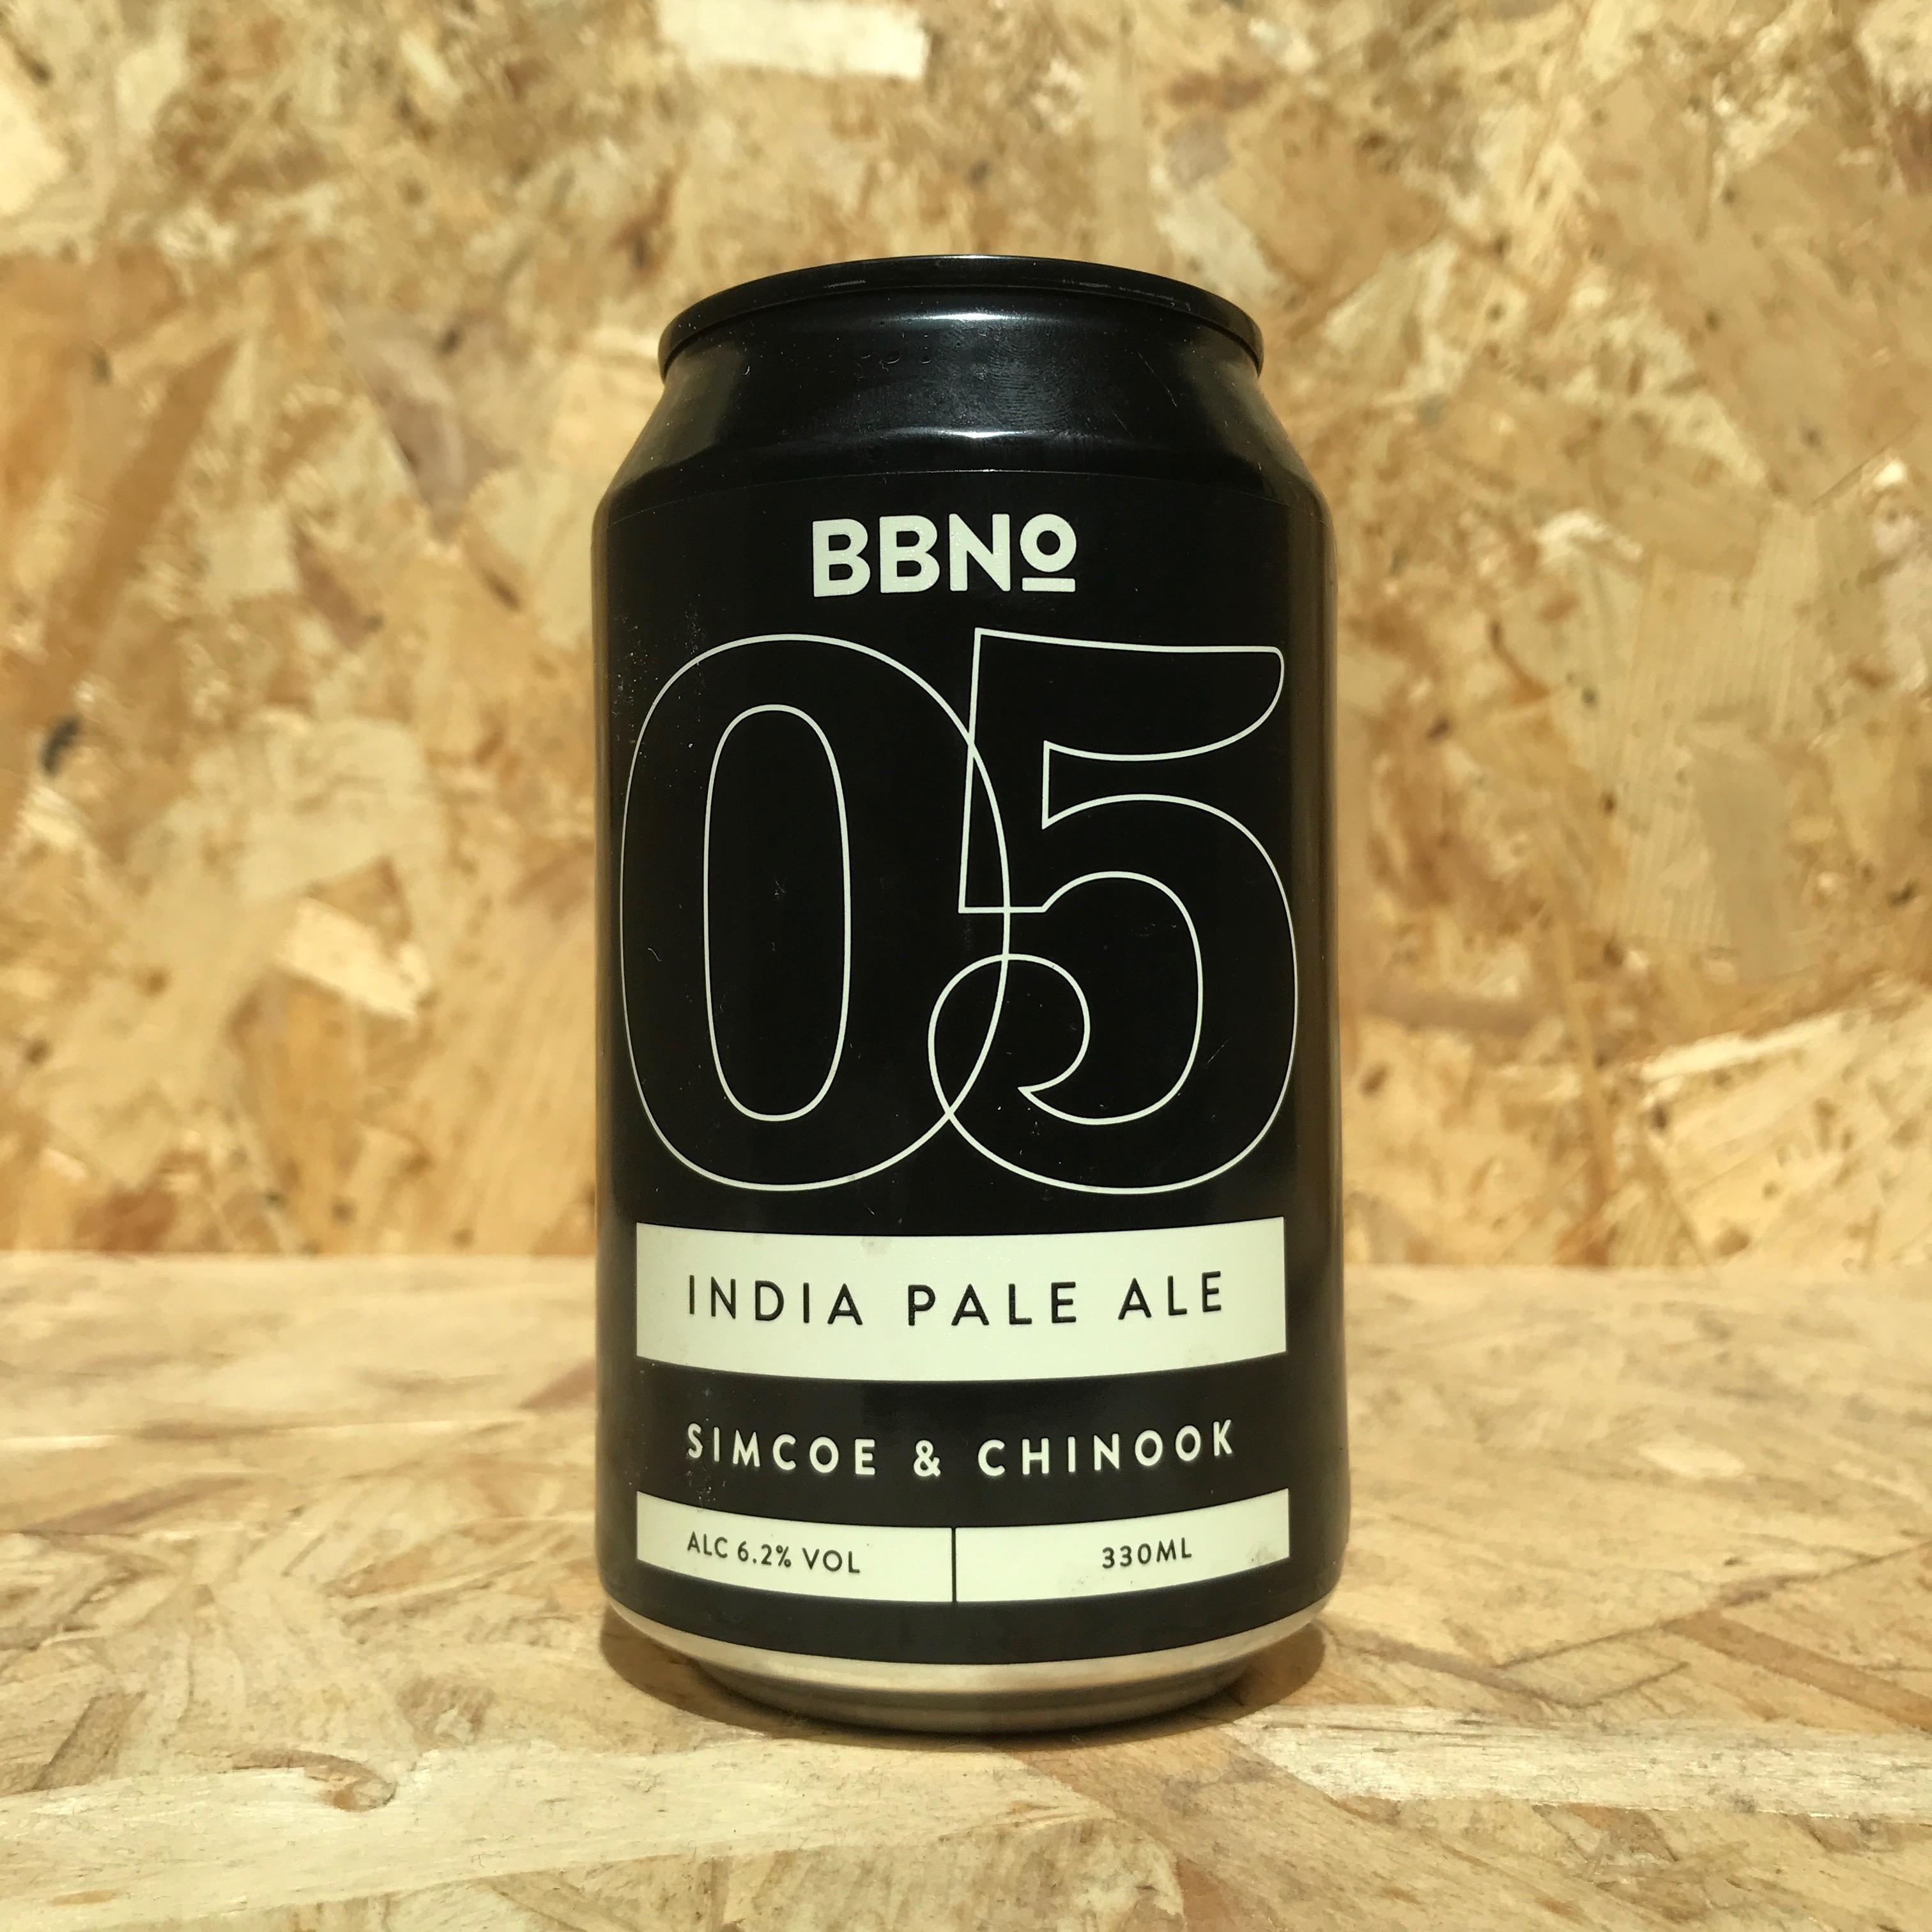 BBNo - 05 India Pale Ale Simcoe & Chinook